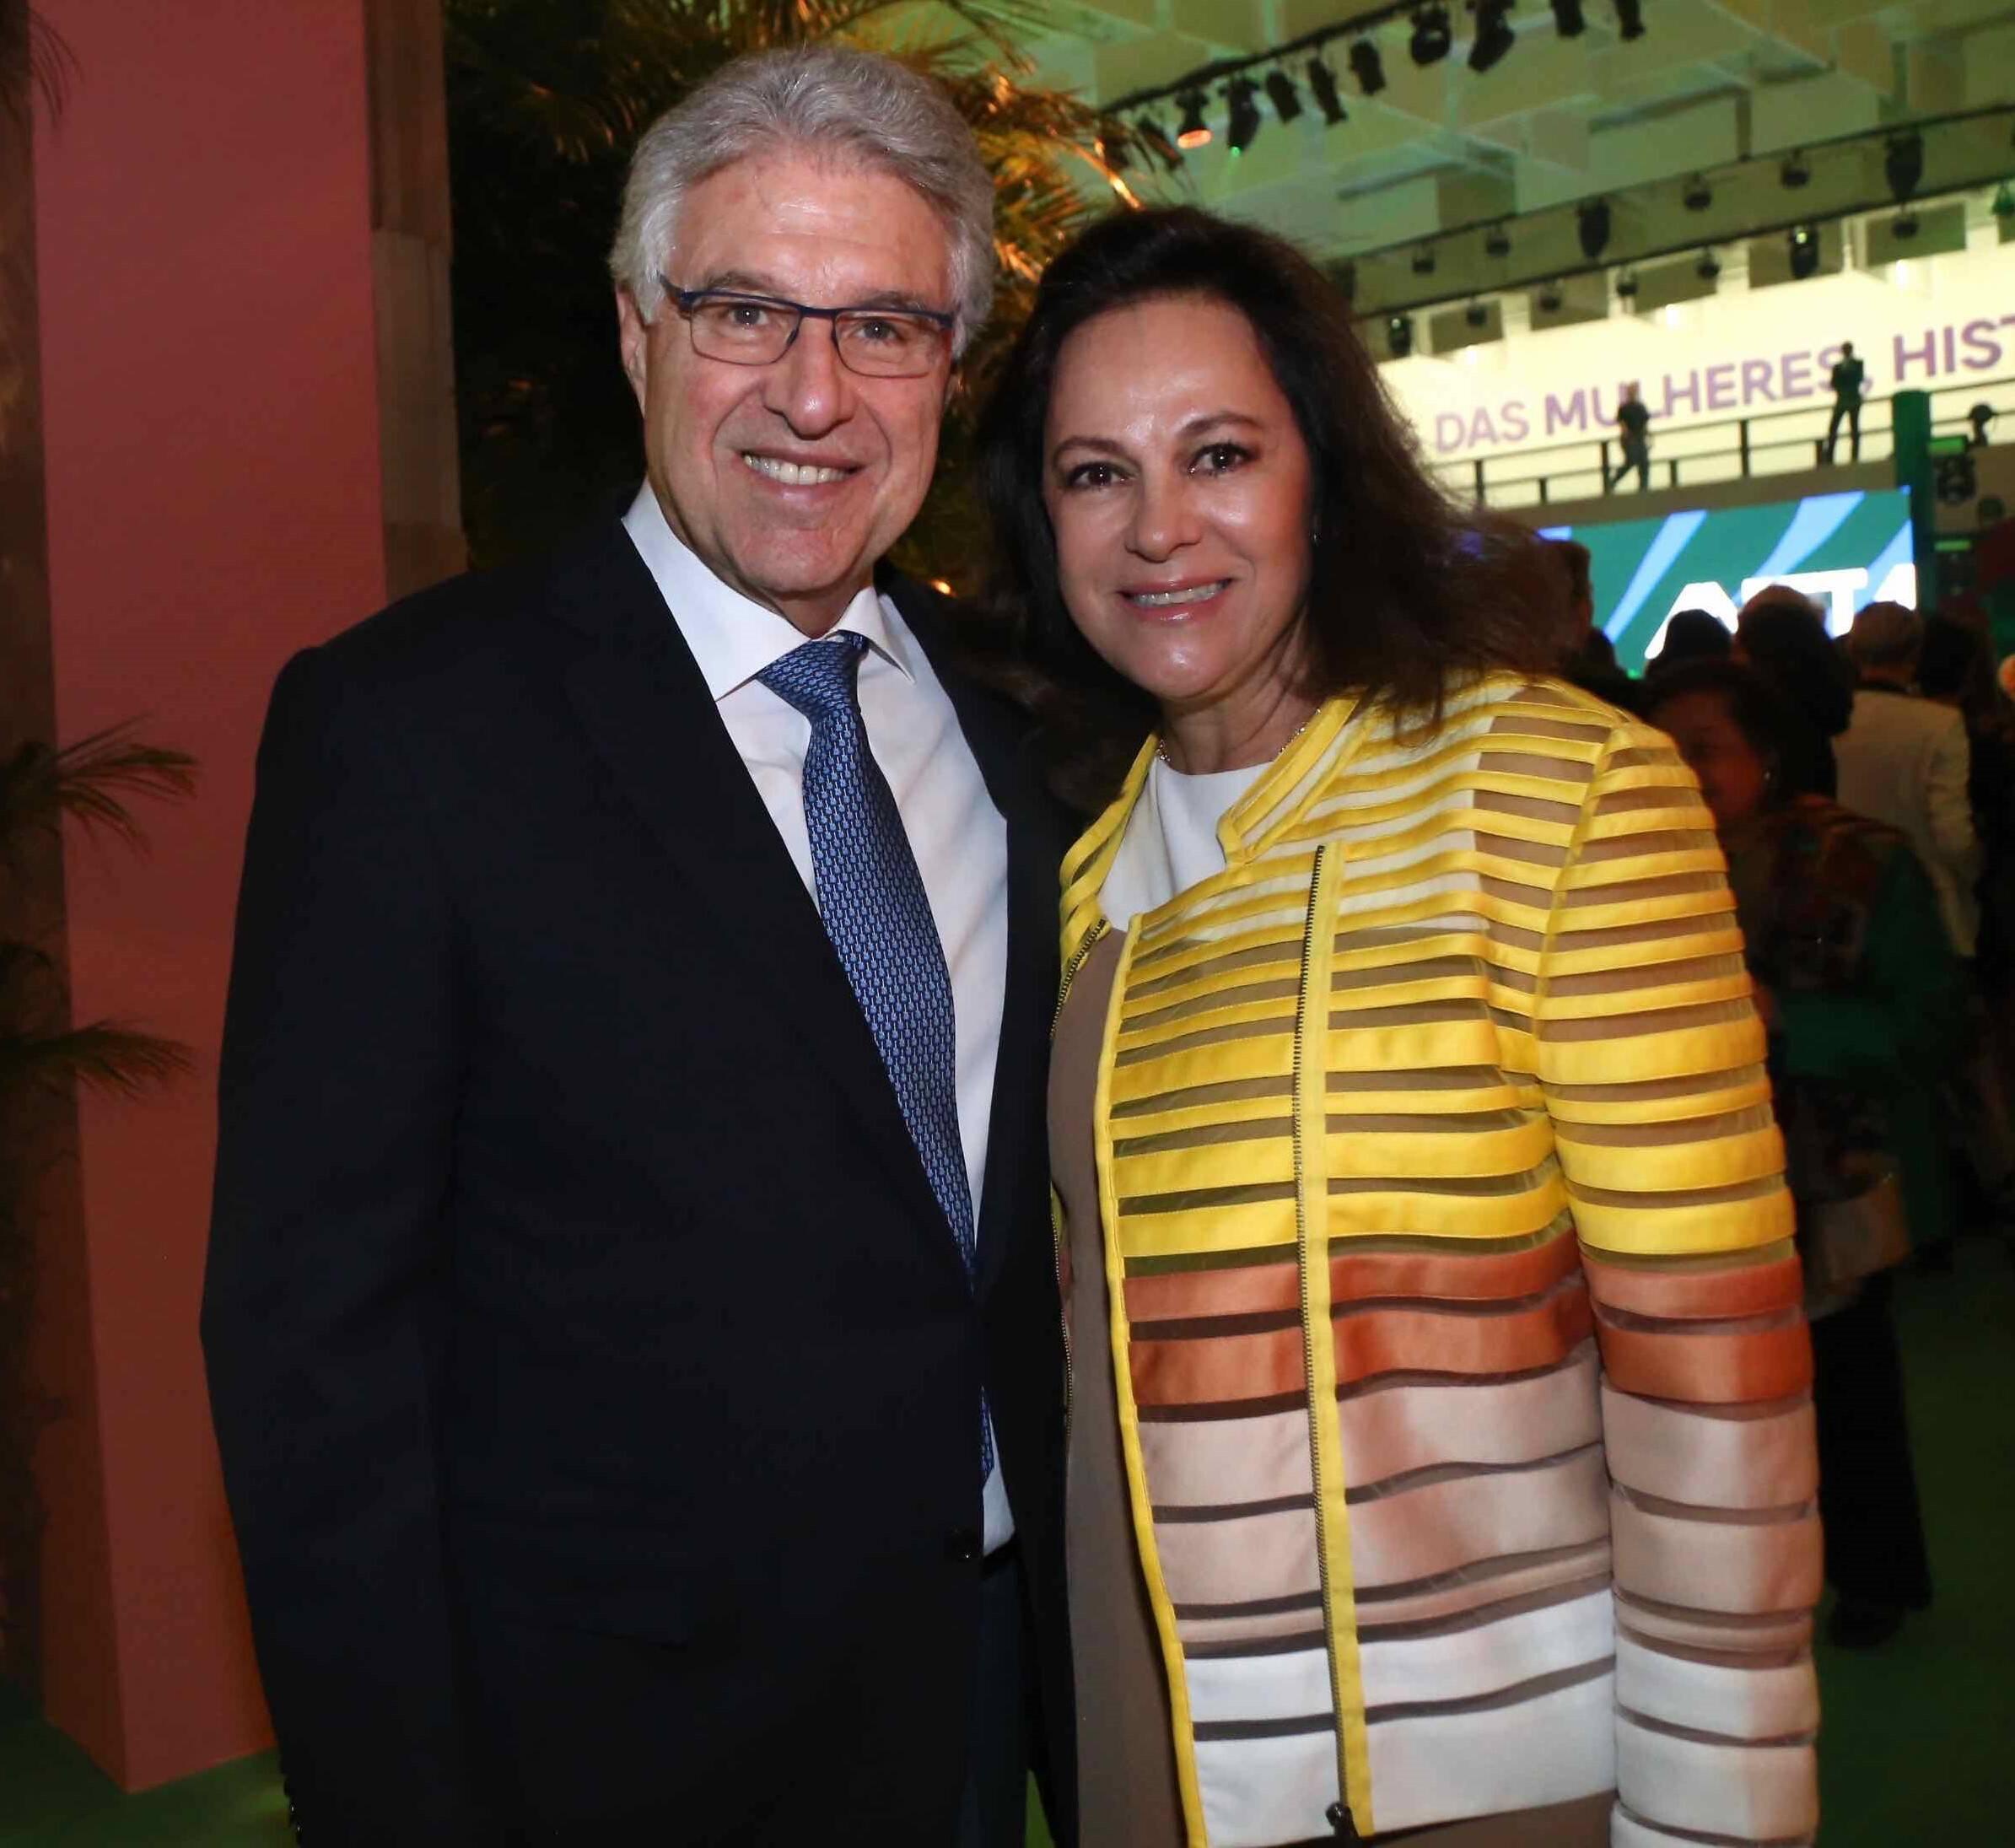 Luiz Francisco Novelli Viana e Eliane Viana  /Foto: Denise Andrade